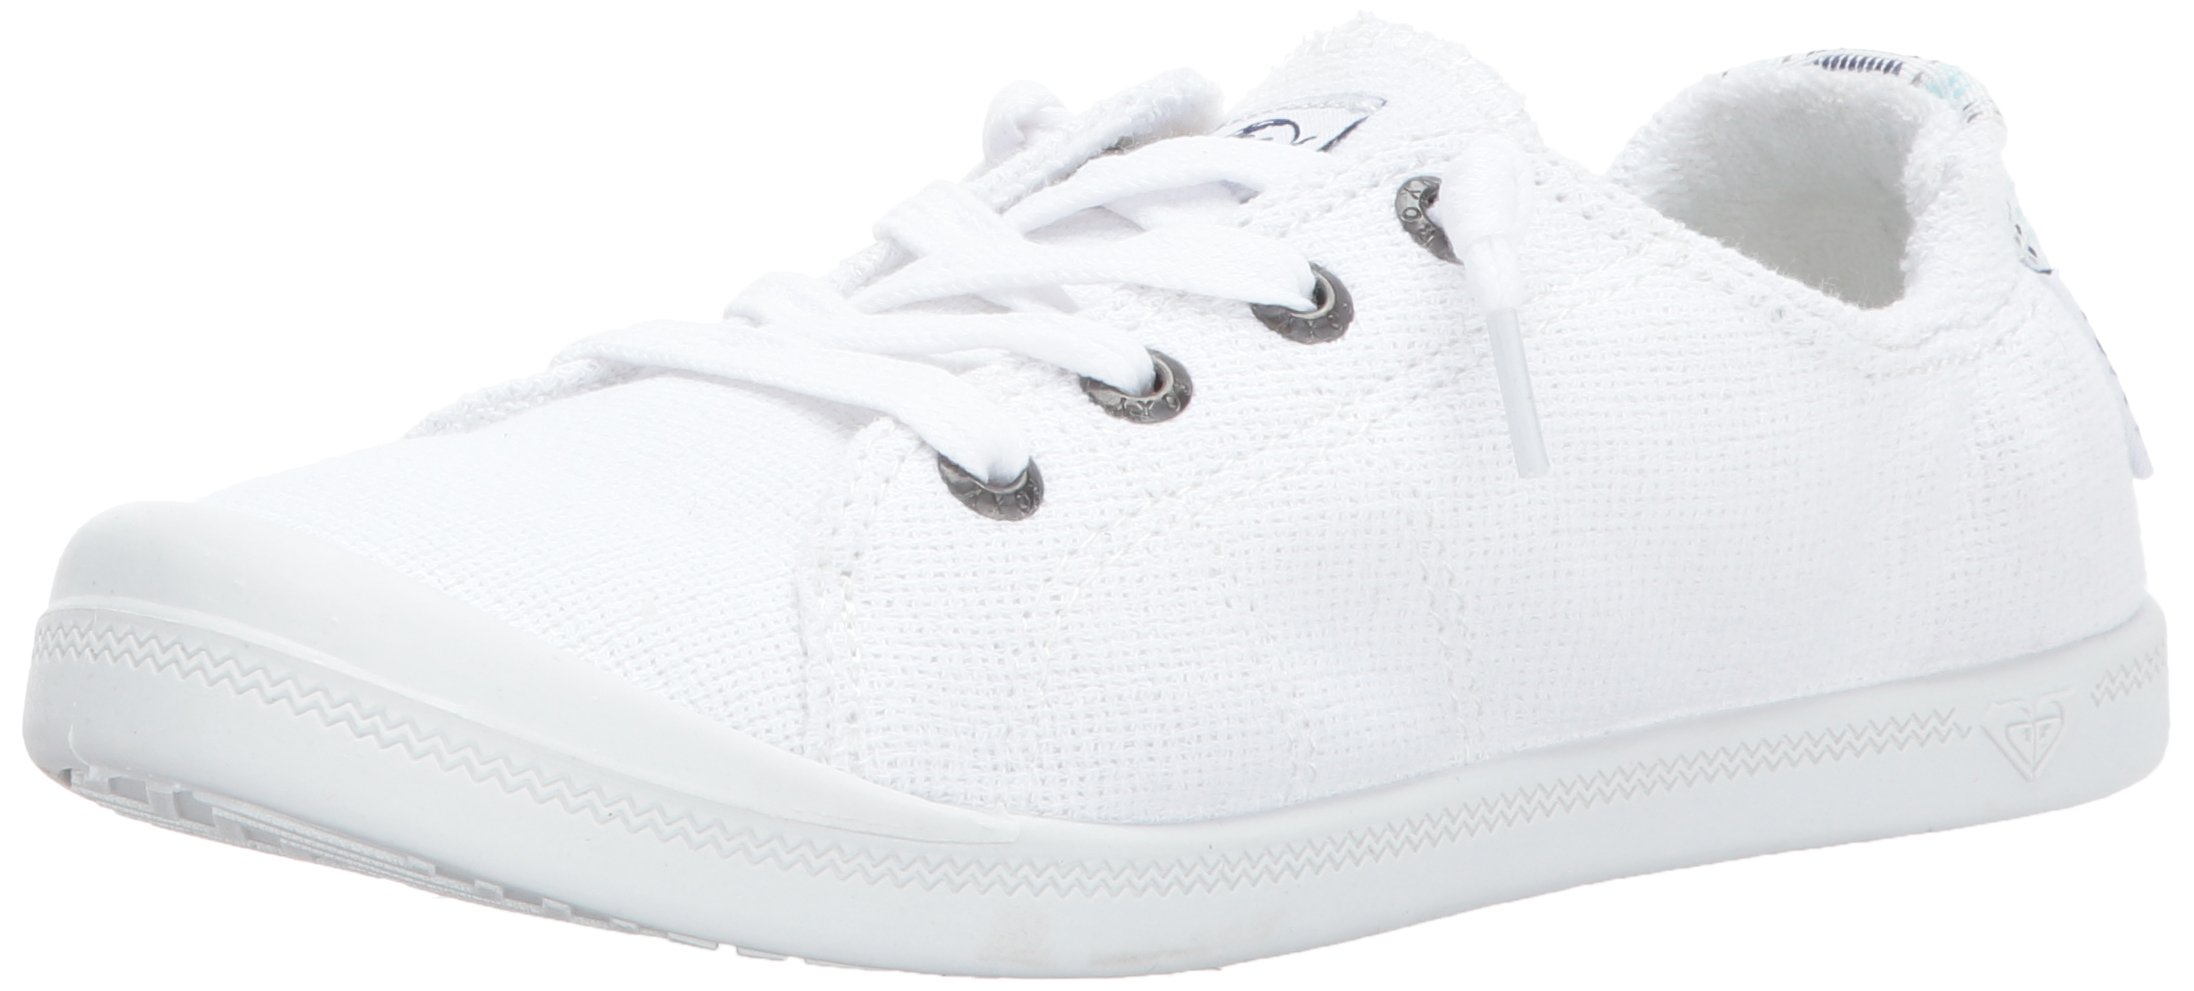 Roxy Womens Rory Sneaker White